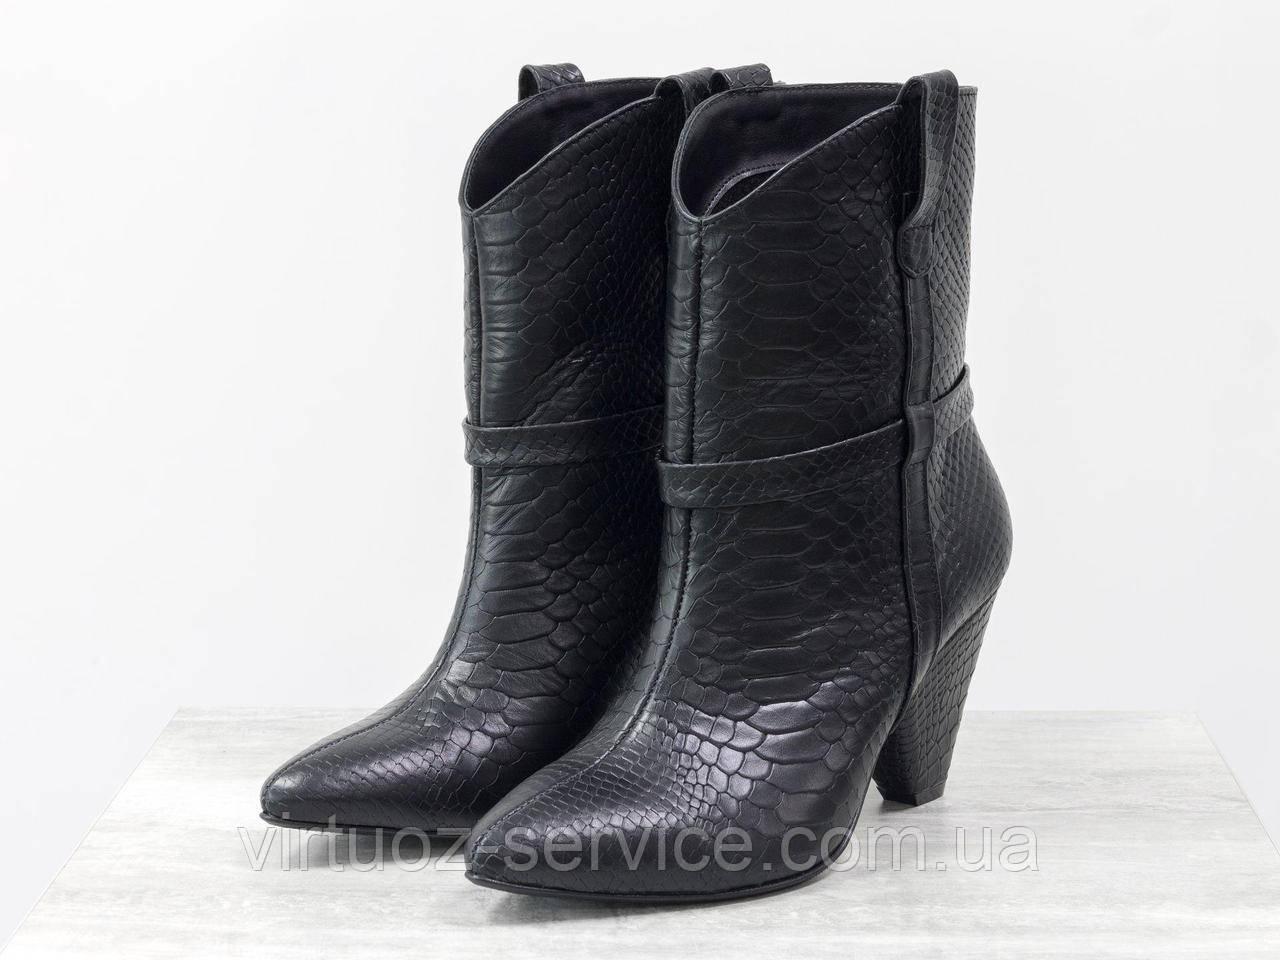 Ботинки женские Gino Figini Б-1902-05из натуральной кожи